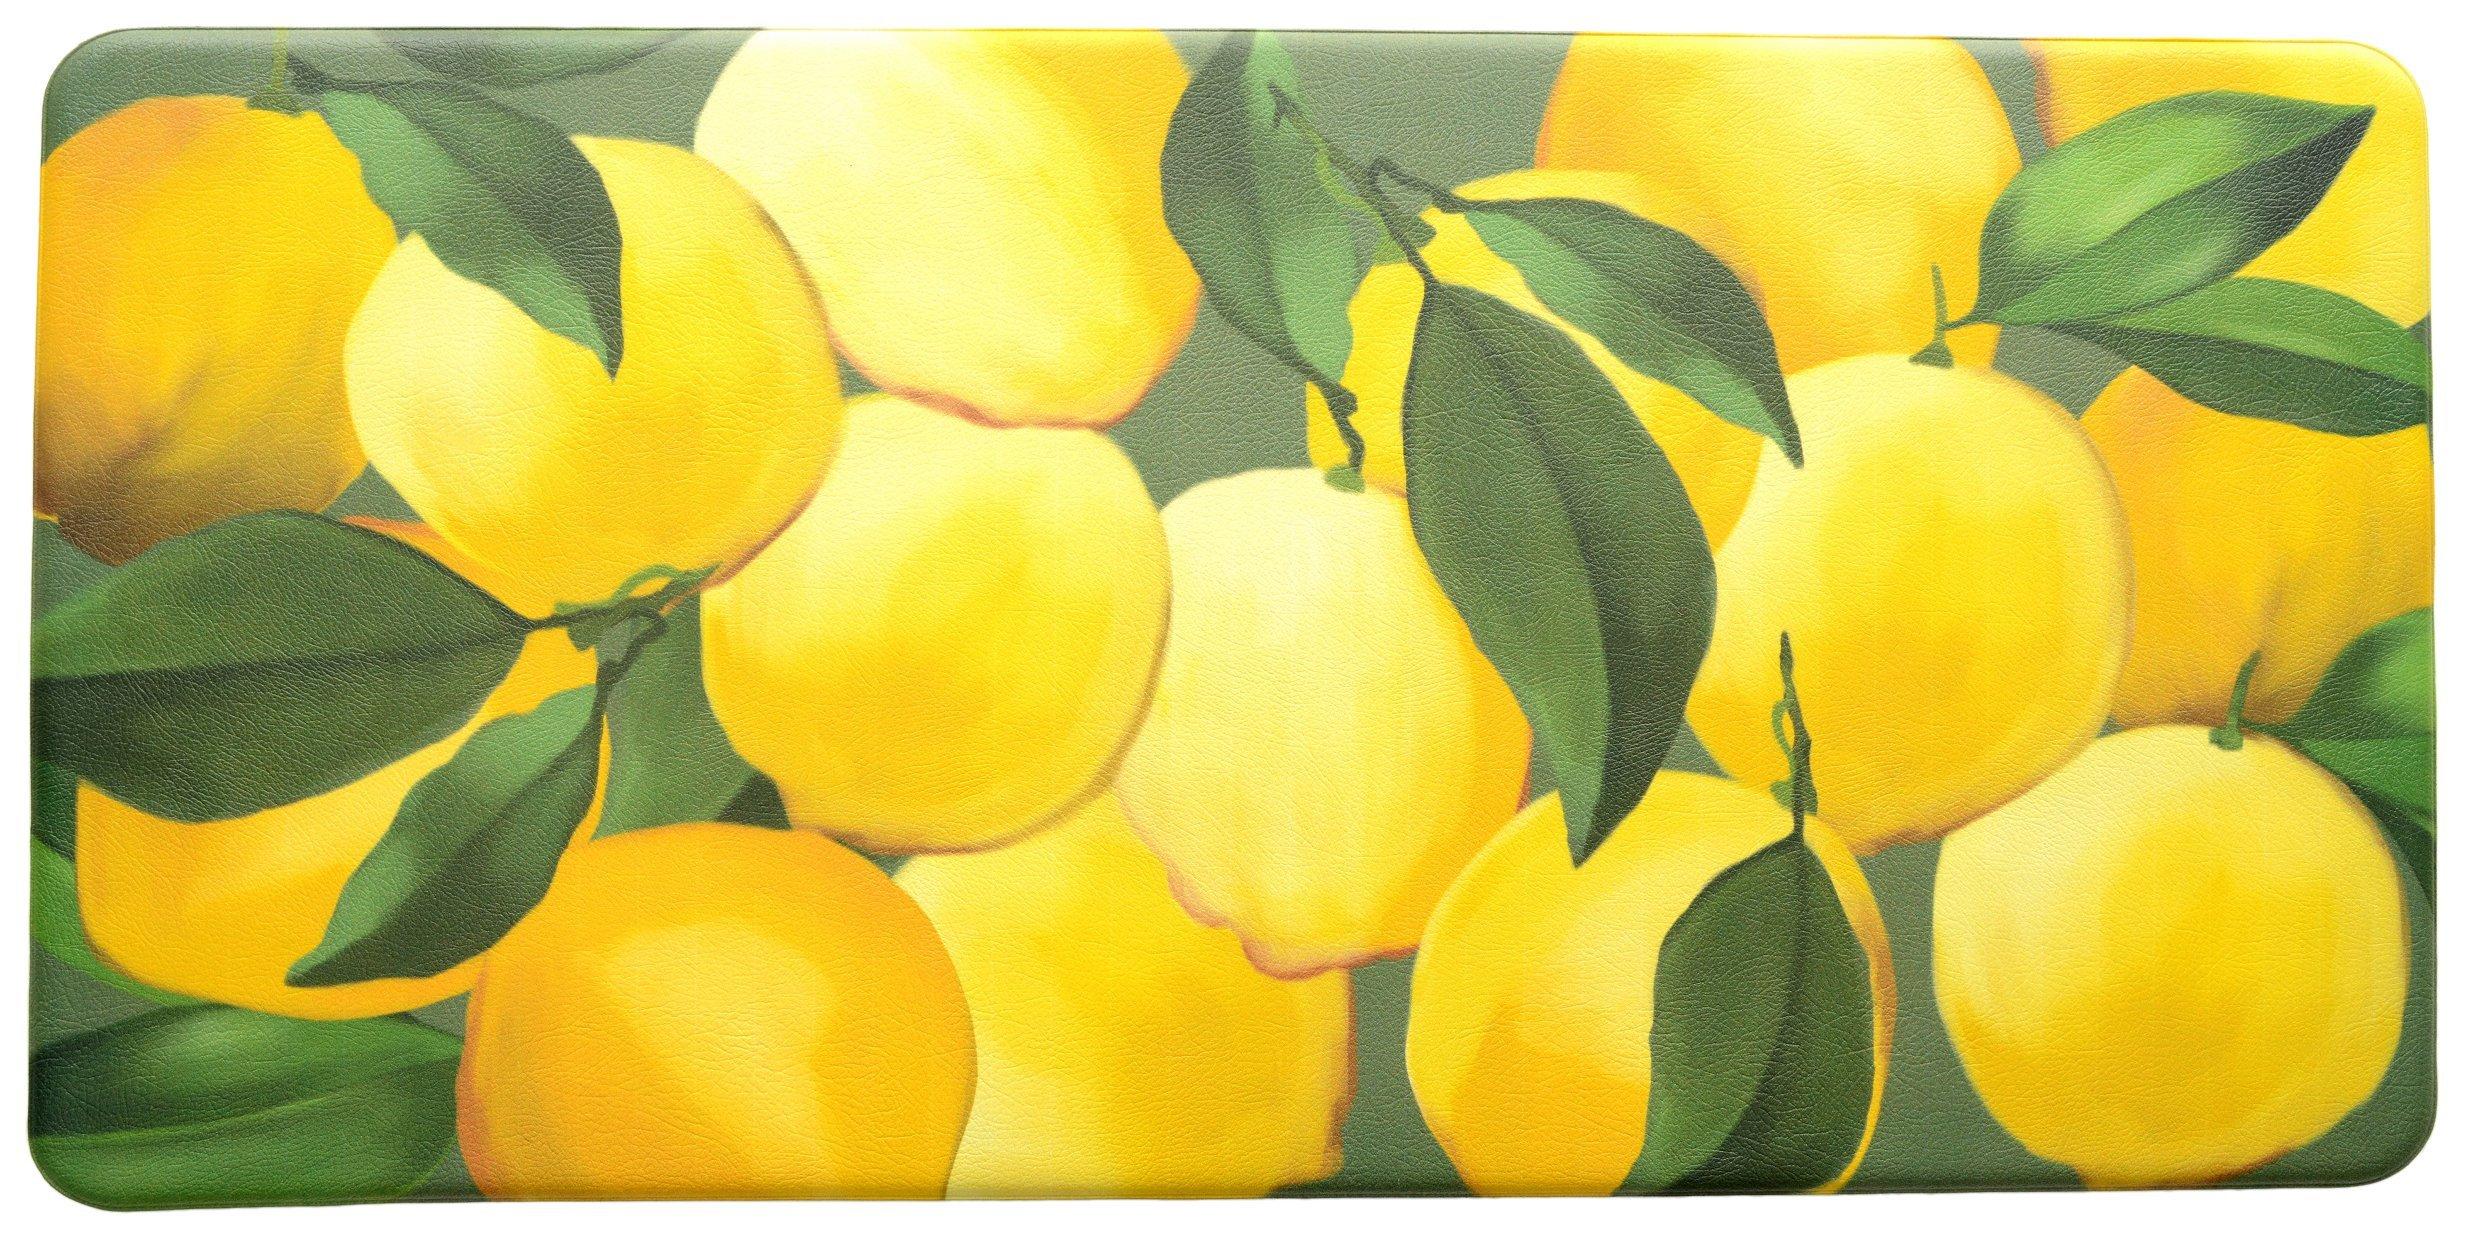 Stephan Roberts Premium Anti-Fatigue Kitchen Mat, 20'' x 39''x.5'', Lemons/Multicolored